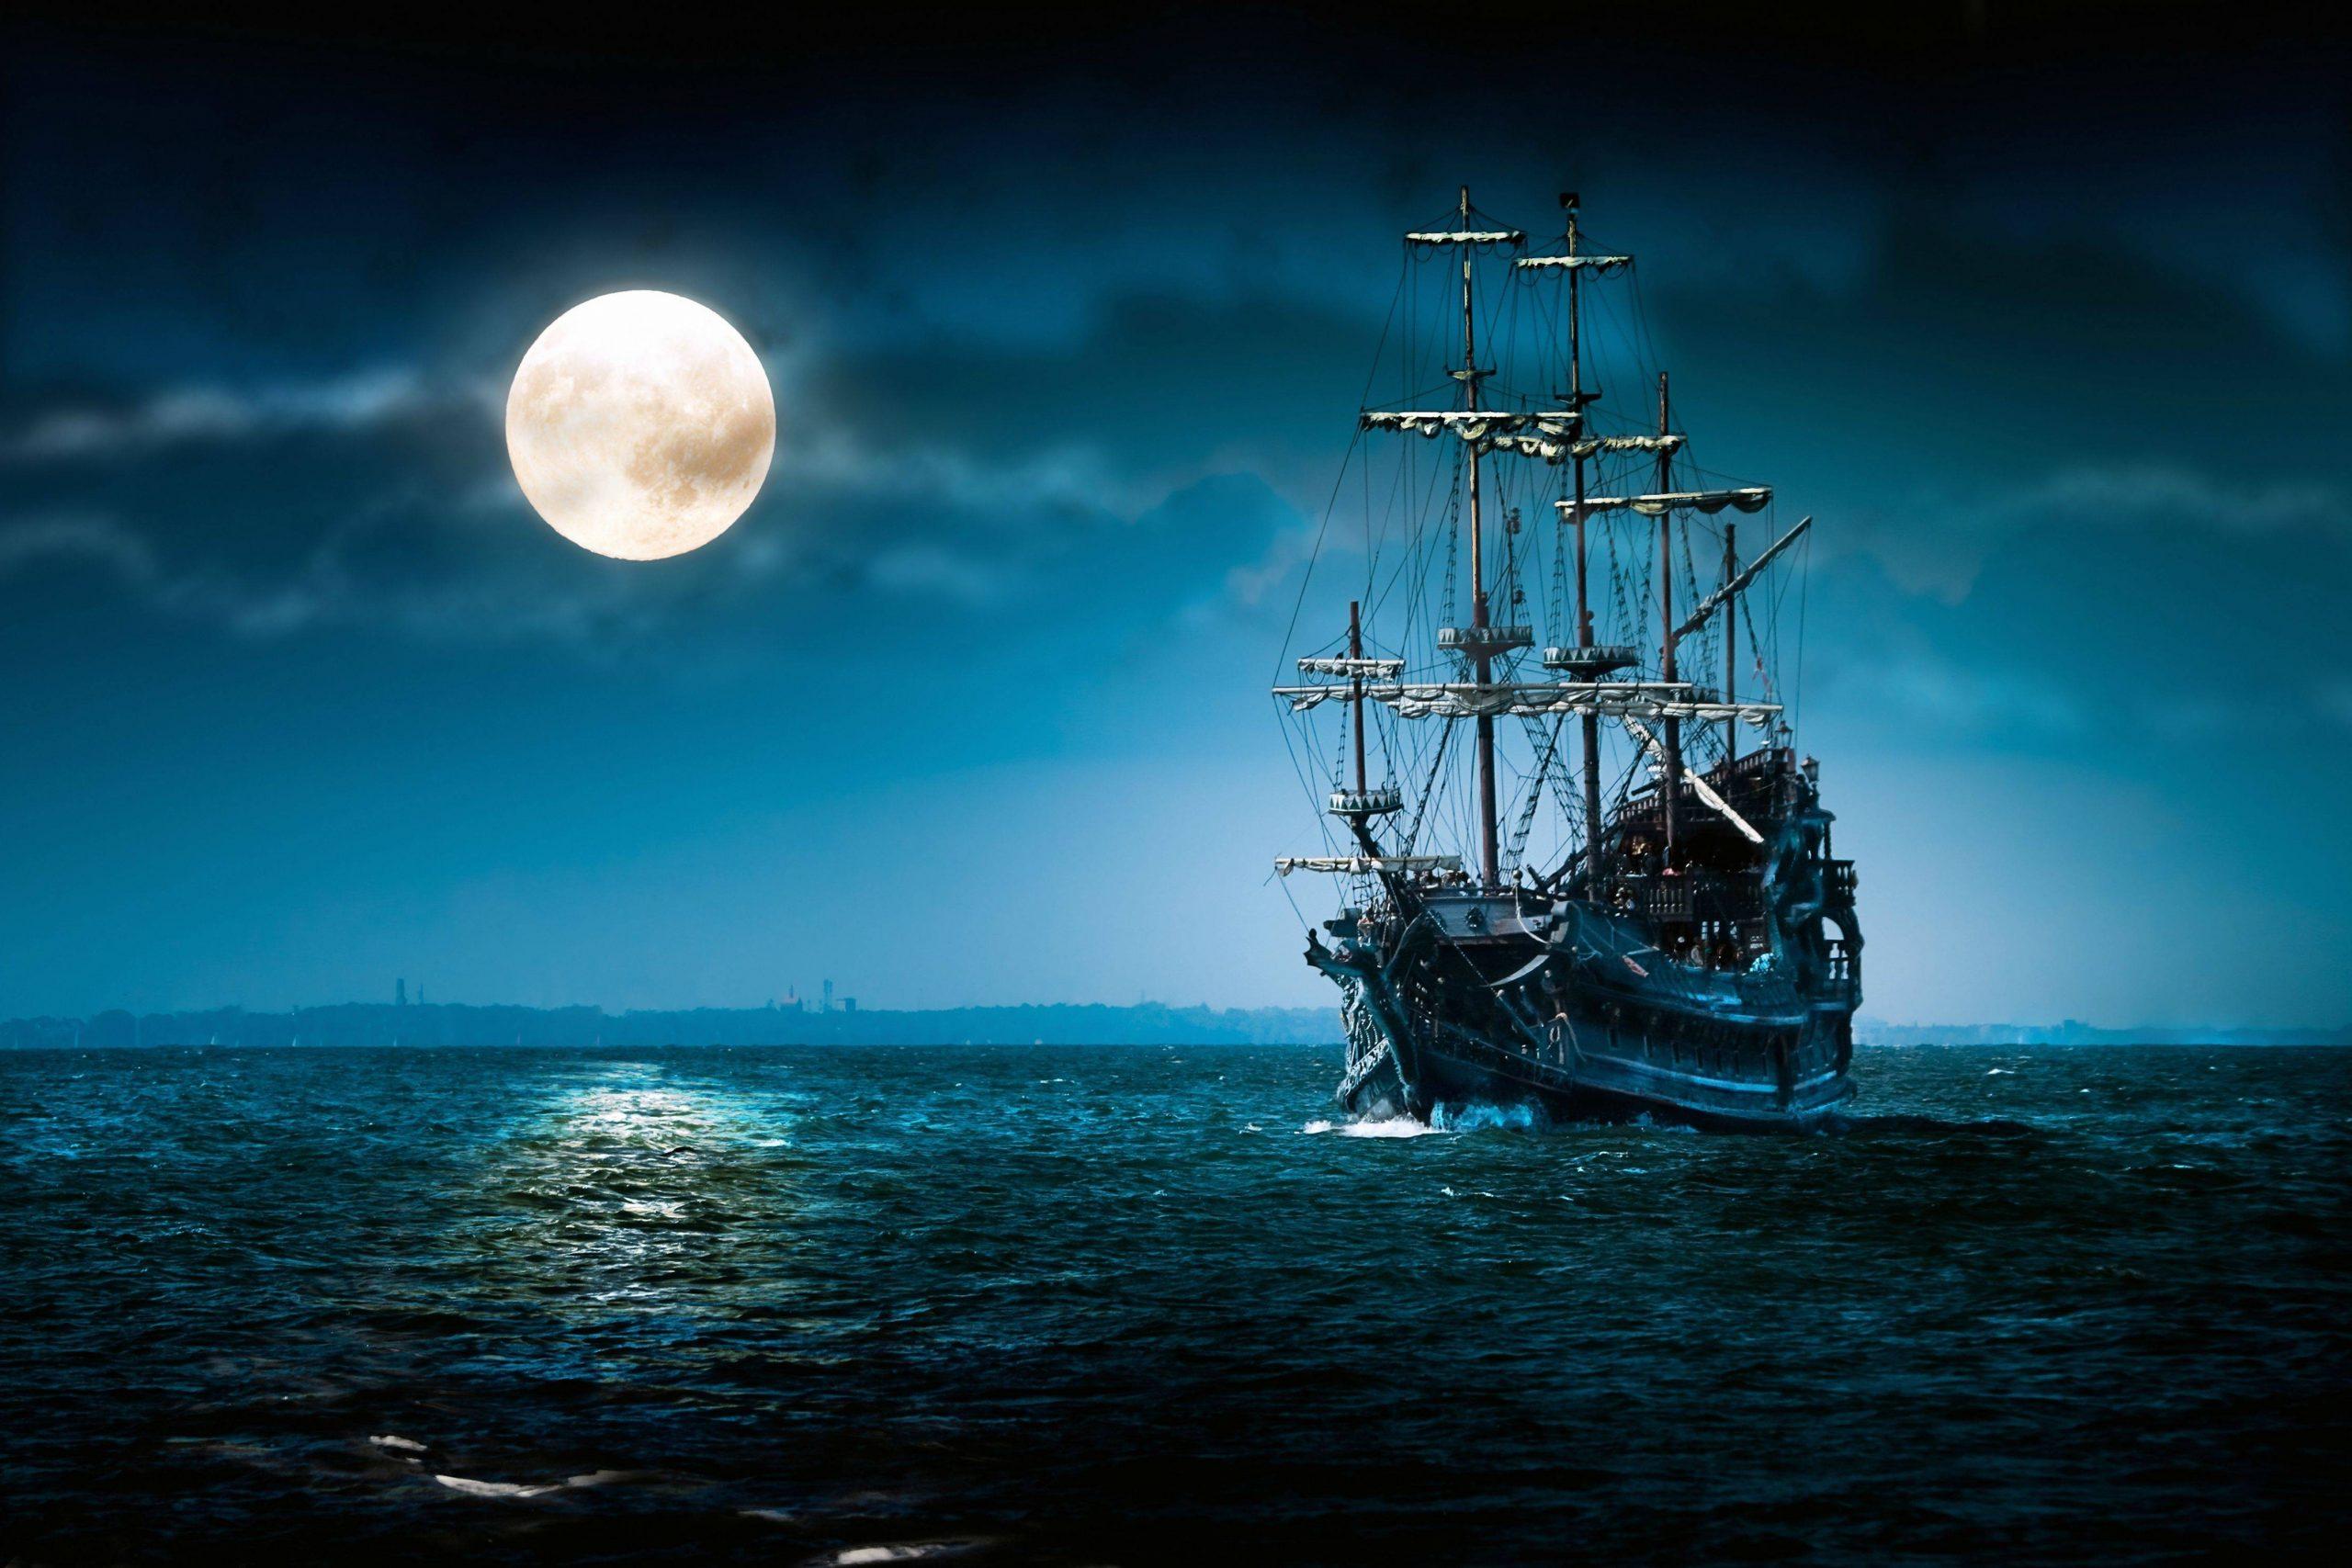 144404-pirates-ship-moon-sea